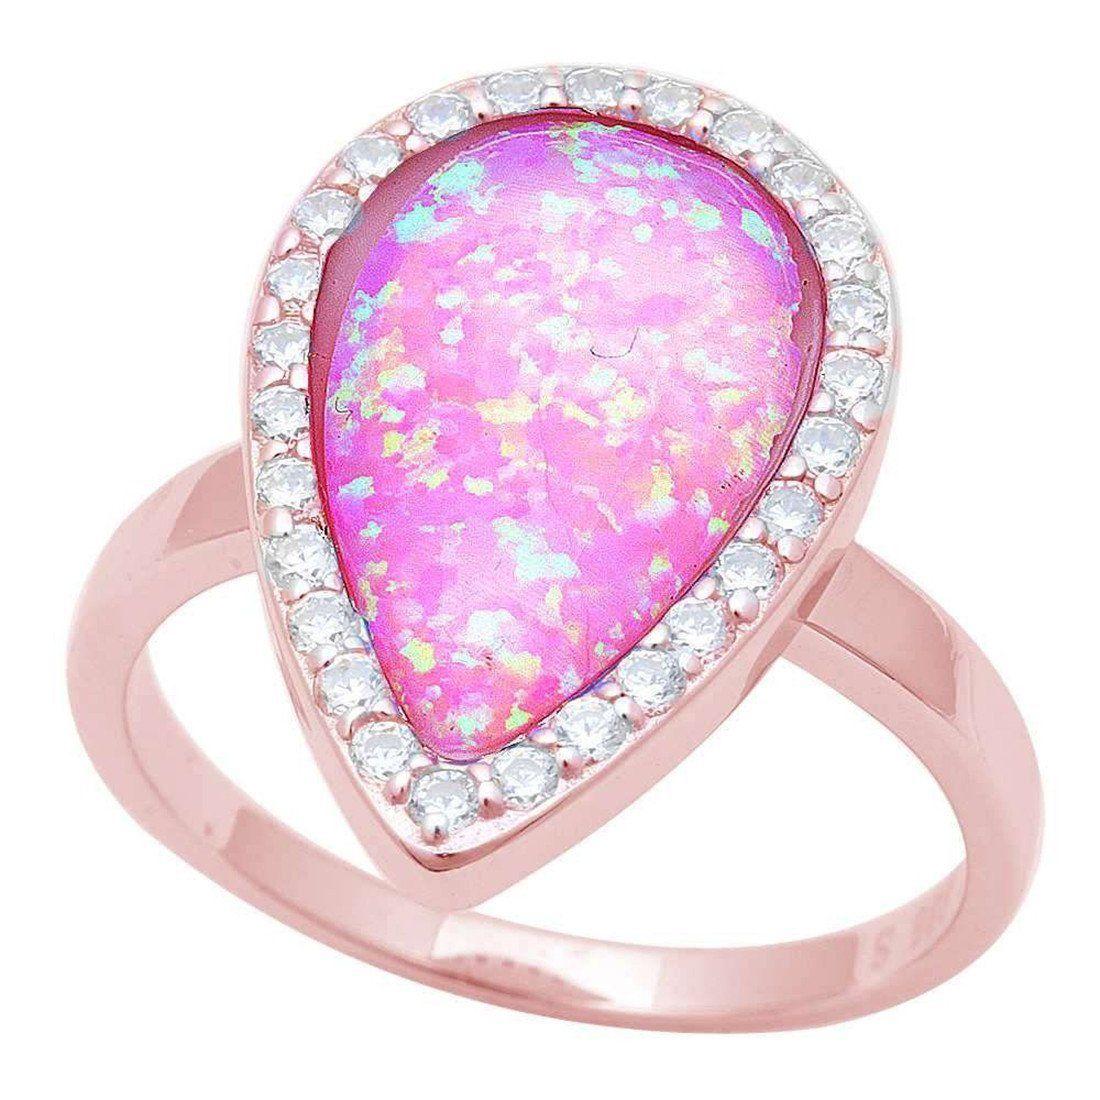 Halo Teardrop Ring Pear Created Pink Opal Blue Opal White Opal Round ...